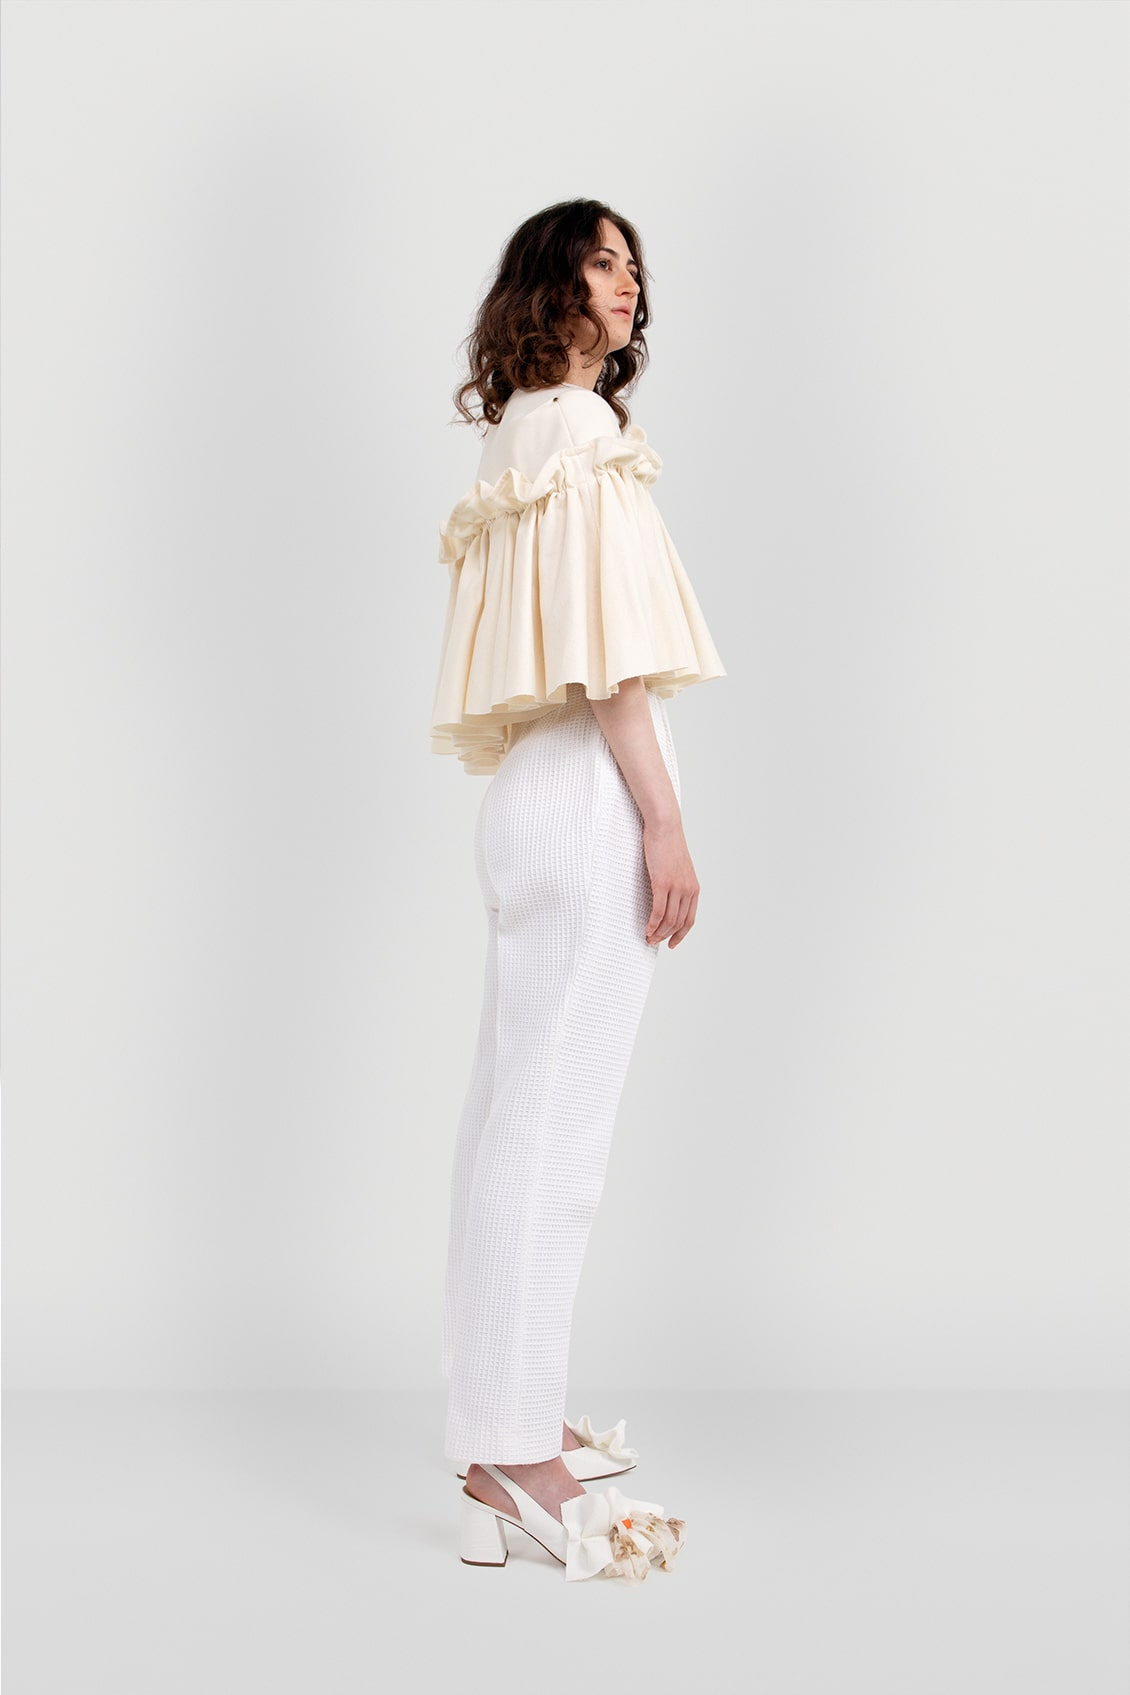 VALDONE Au - Side of the cream colour British wool designer cape HAZEL